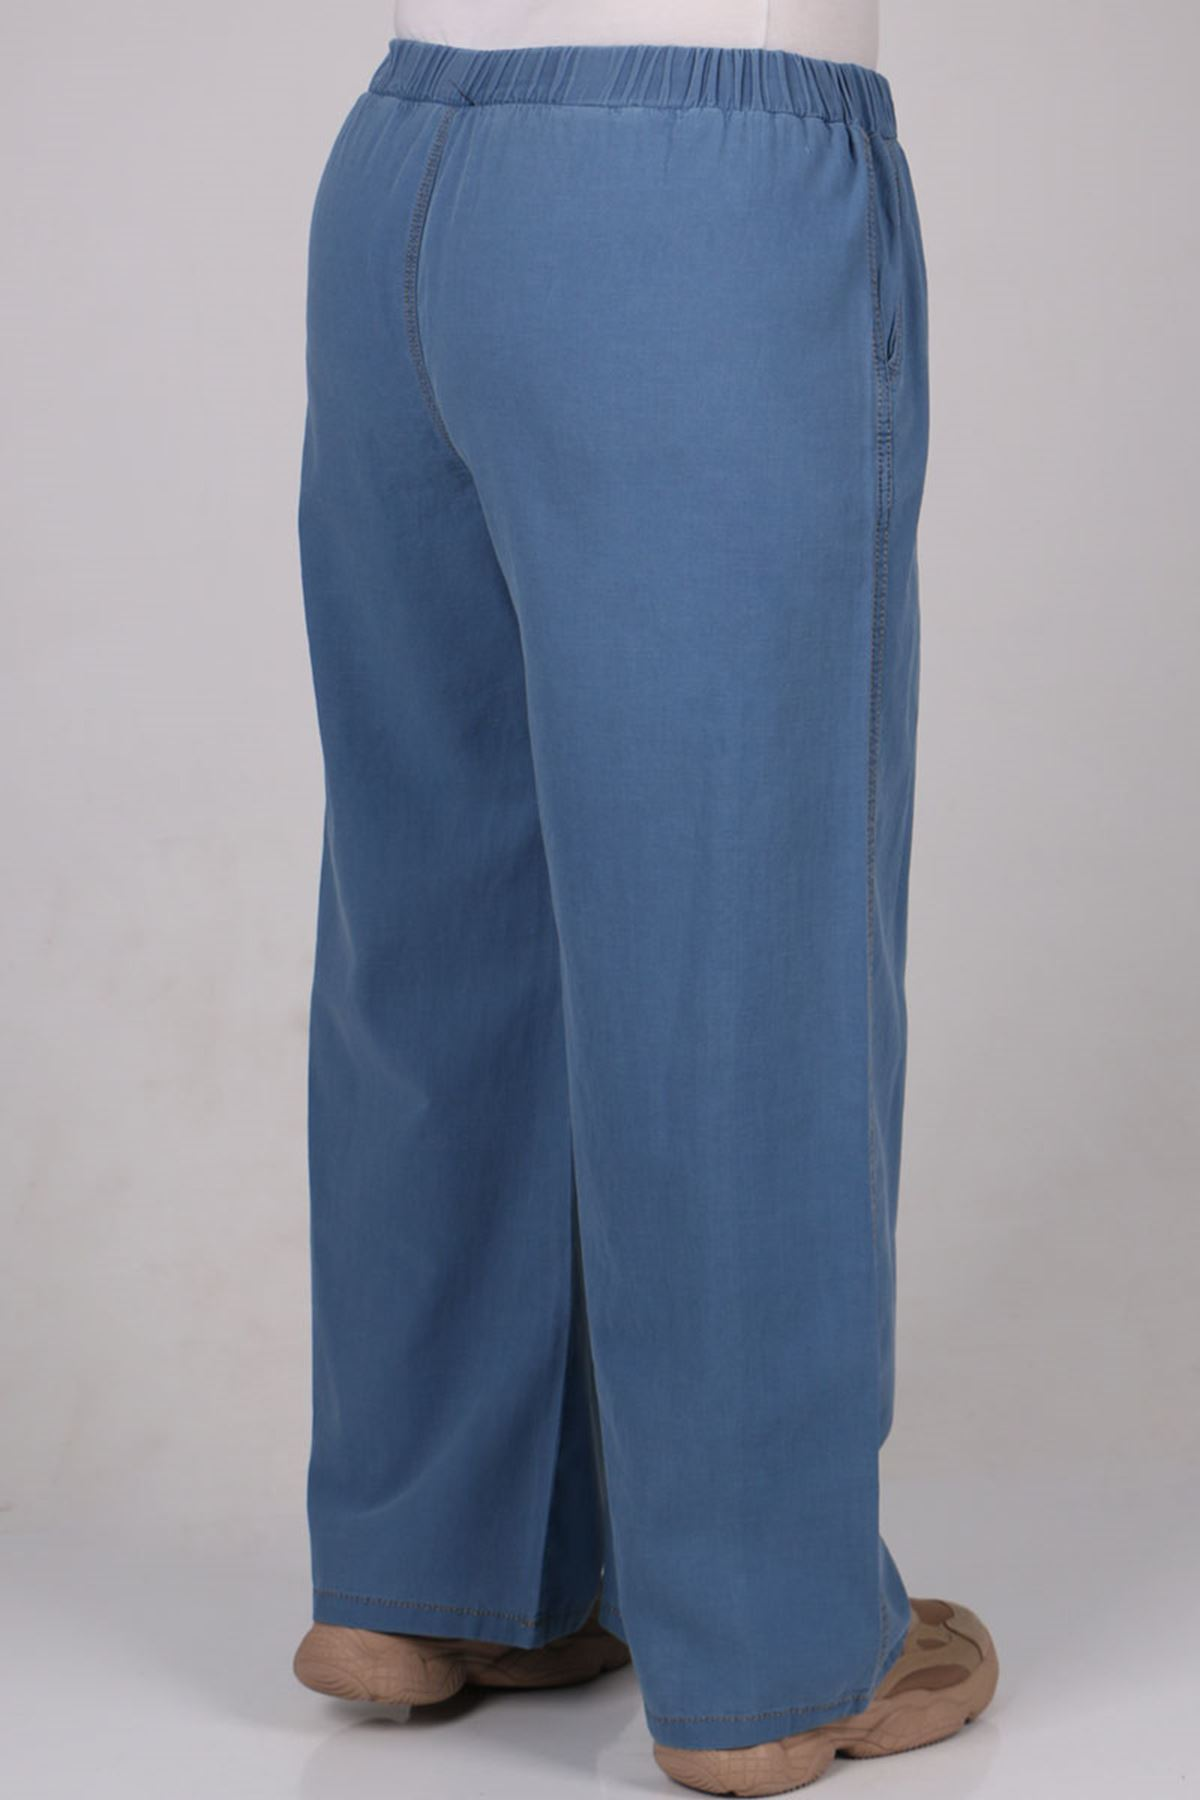 9176 Büyük Beden Bol Paça Kot Pantolon - Mavi